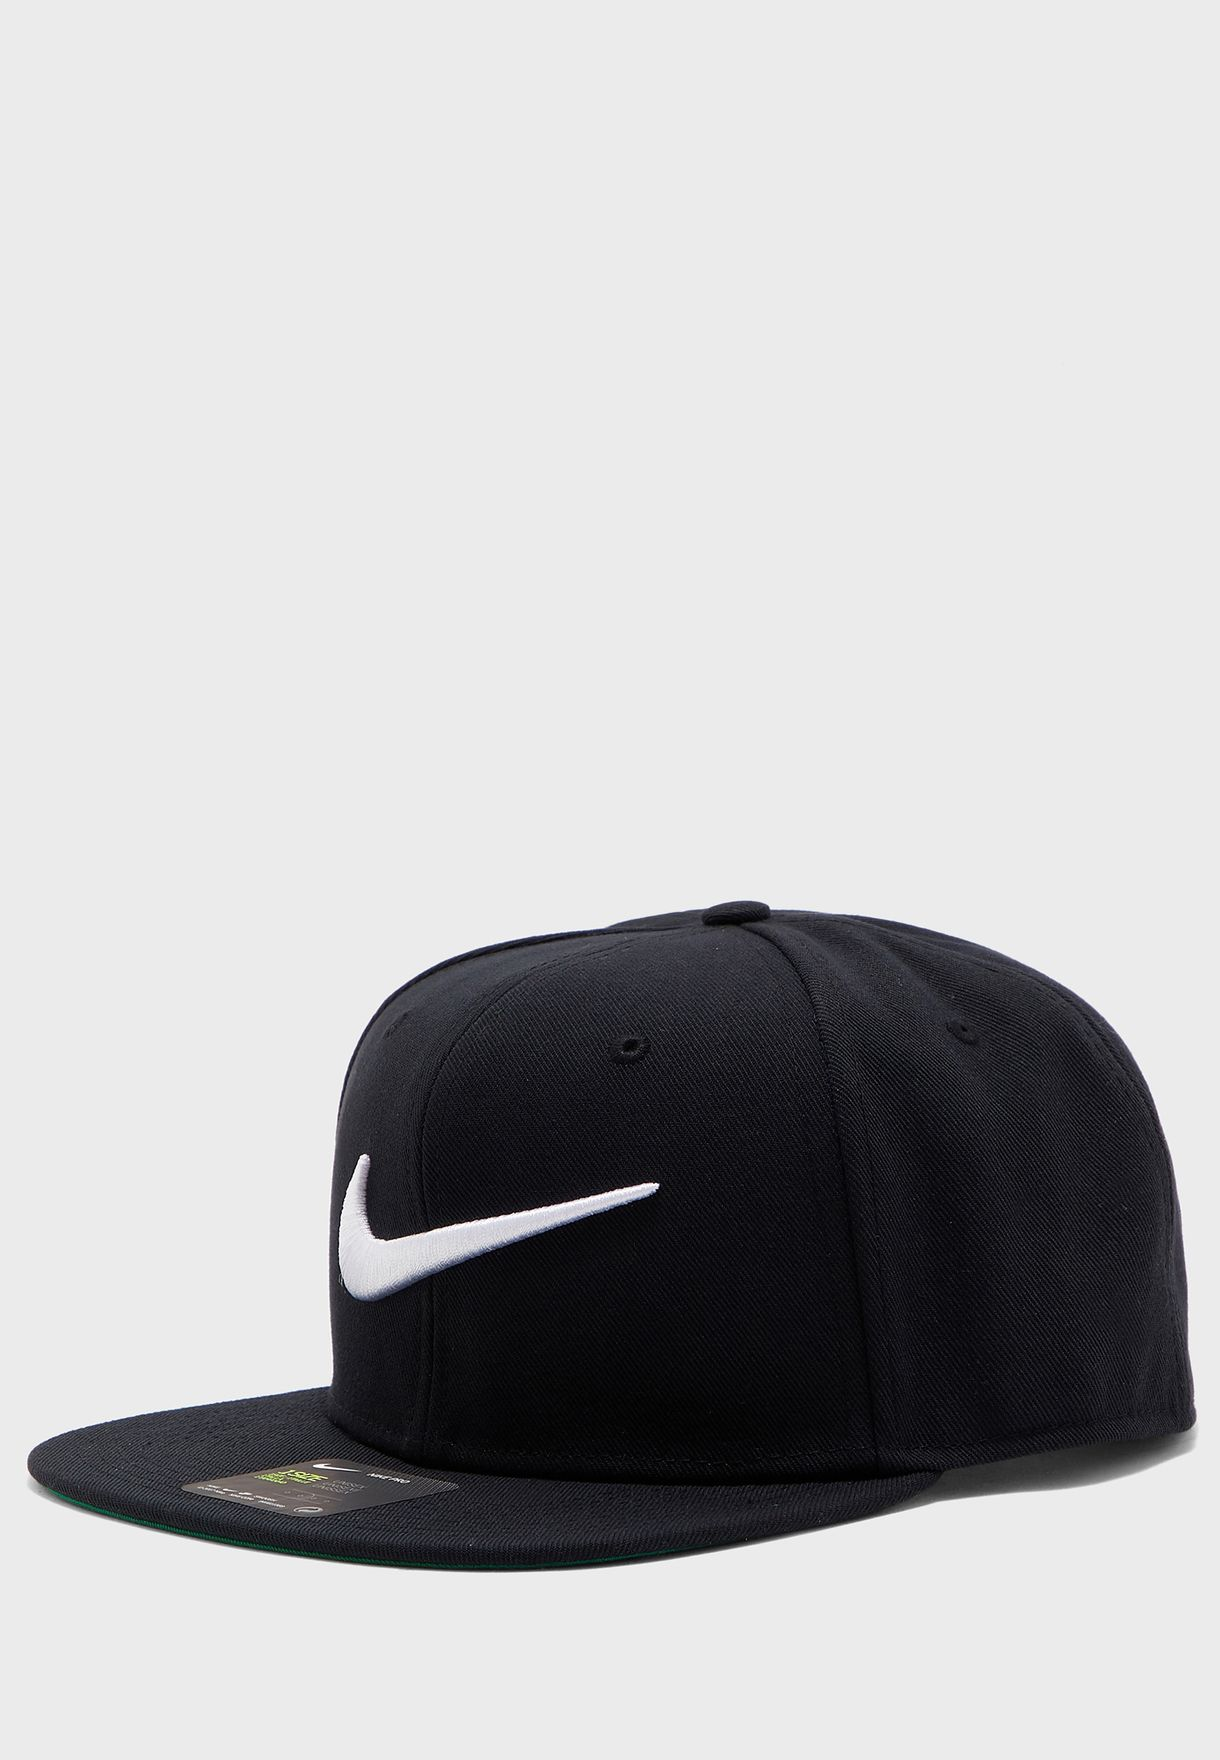 online store 3c452 ff49b Nike. Swoosh Pro Cap